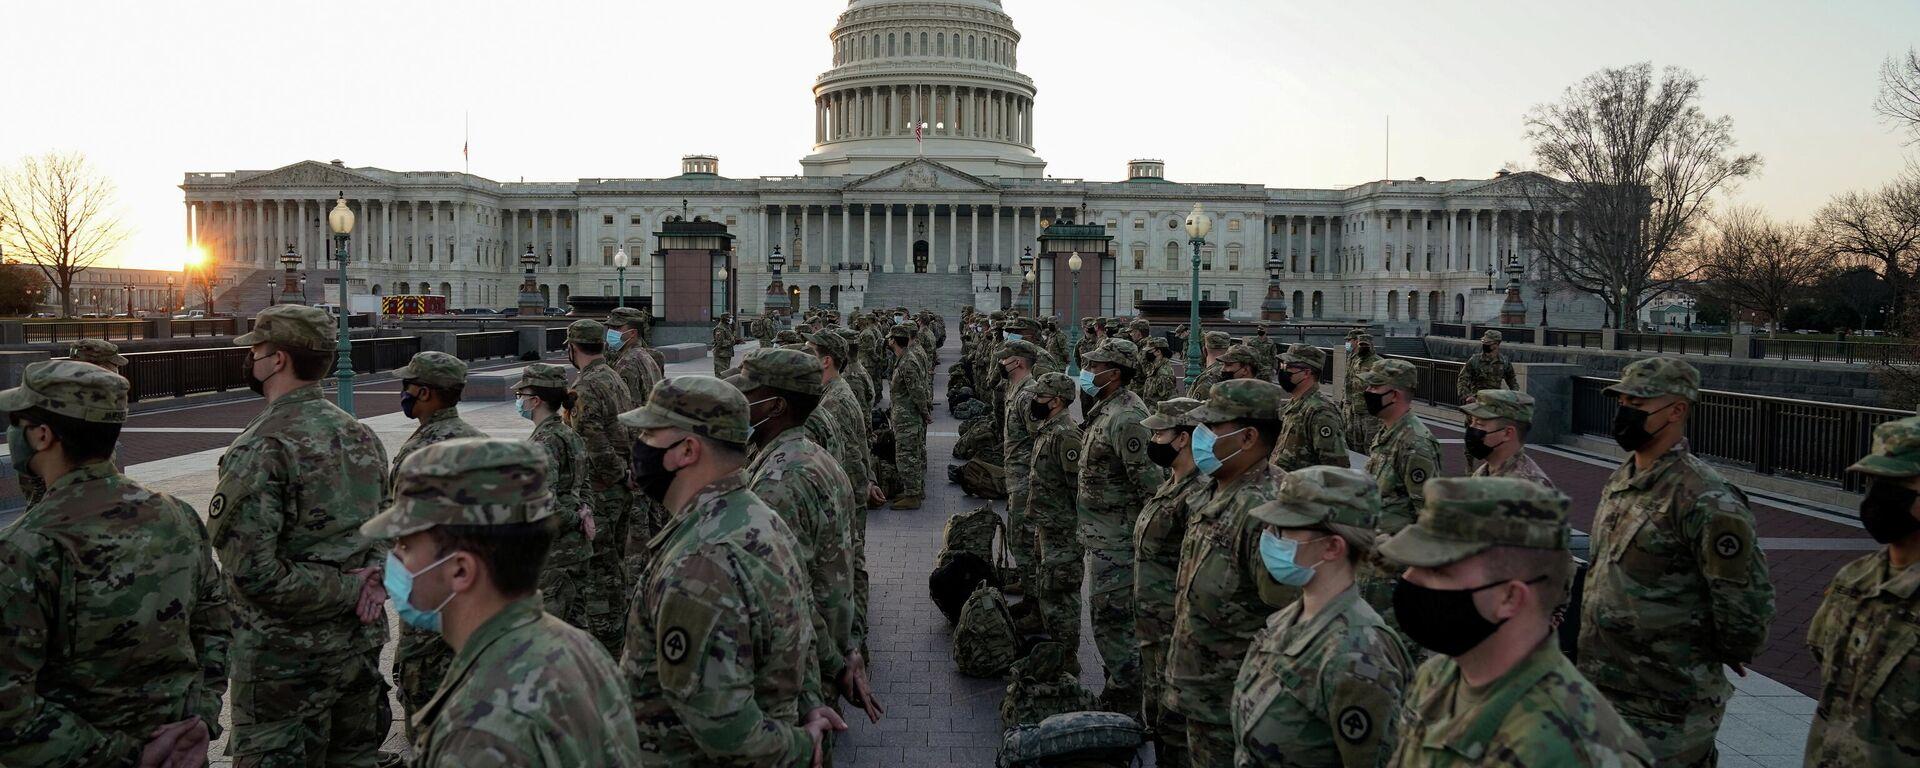 US-Nationalgarde vor dem Kapitol-Gebäude in Washington, 12. Januar 2020 - SNA, 1920, 14.01.2021